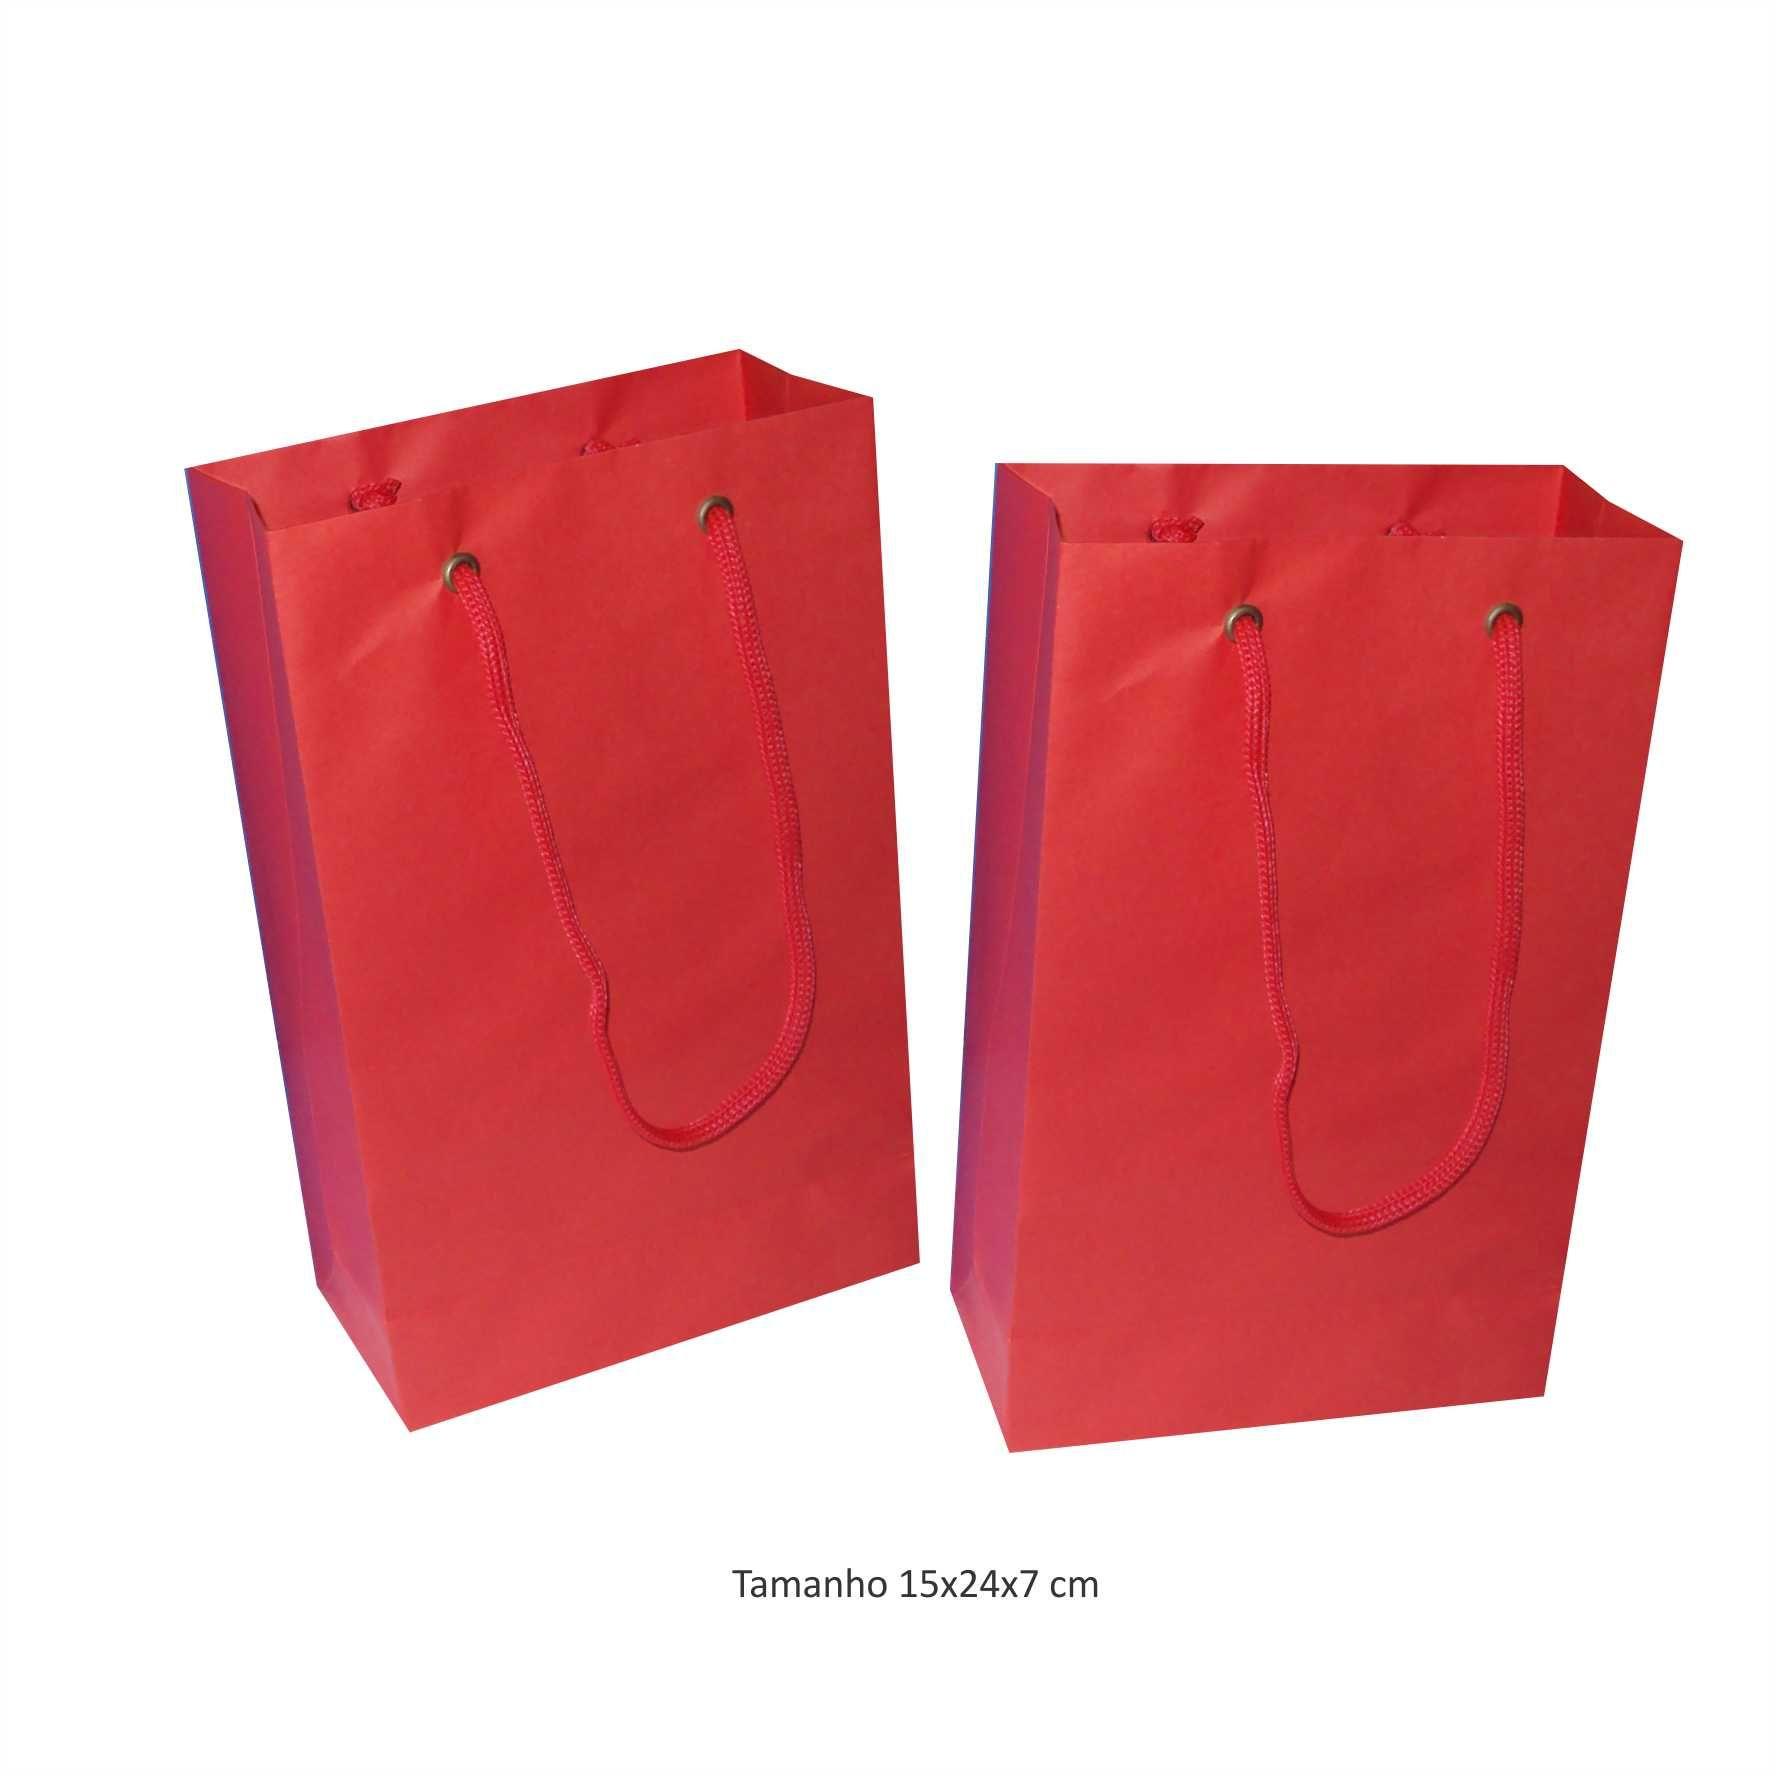 Sacola de papel (15x24x7 cm) pequena - cor vermelha - 10 unidades